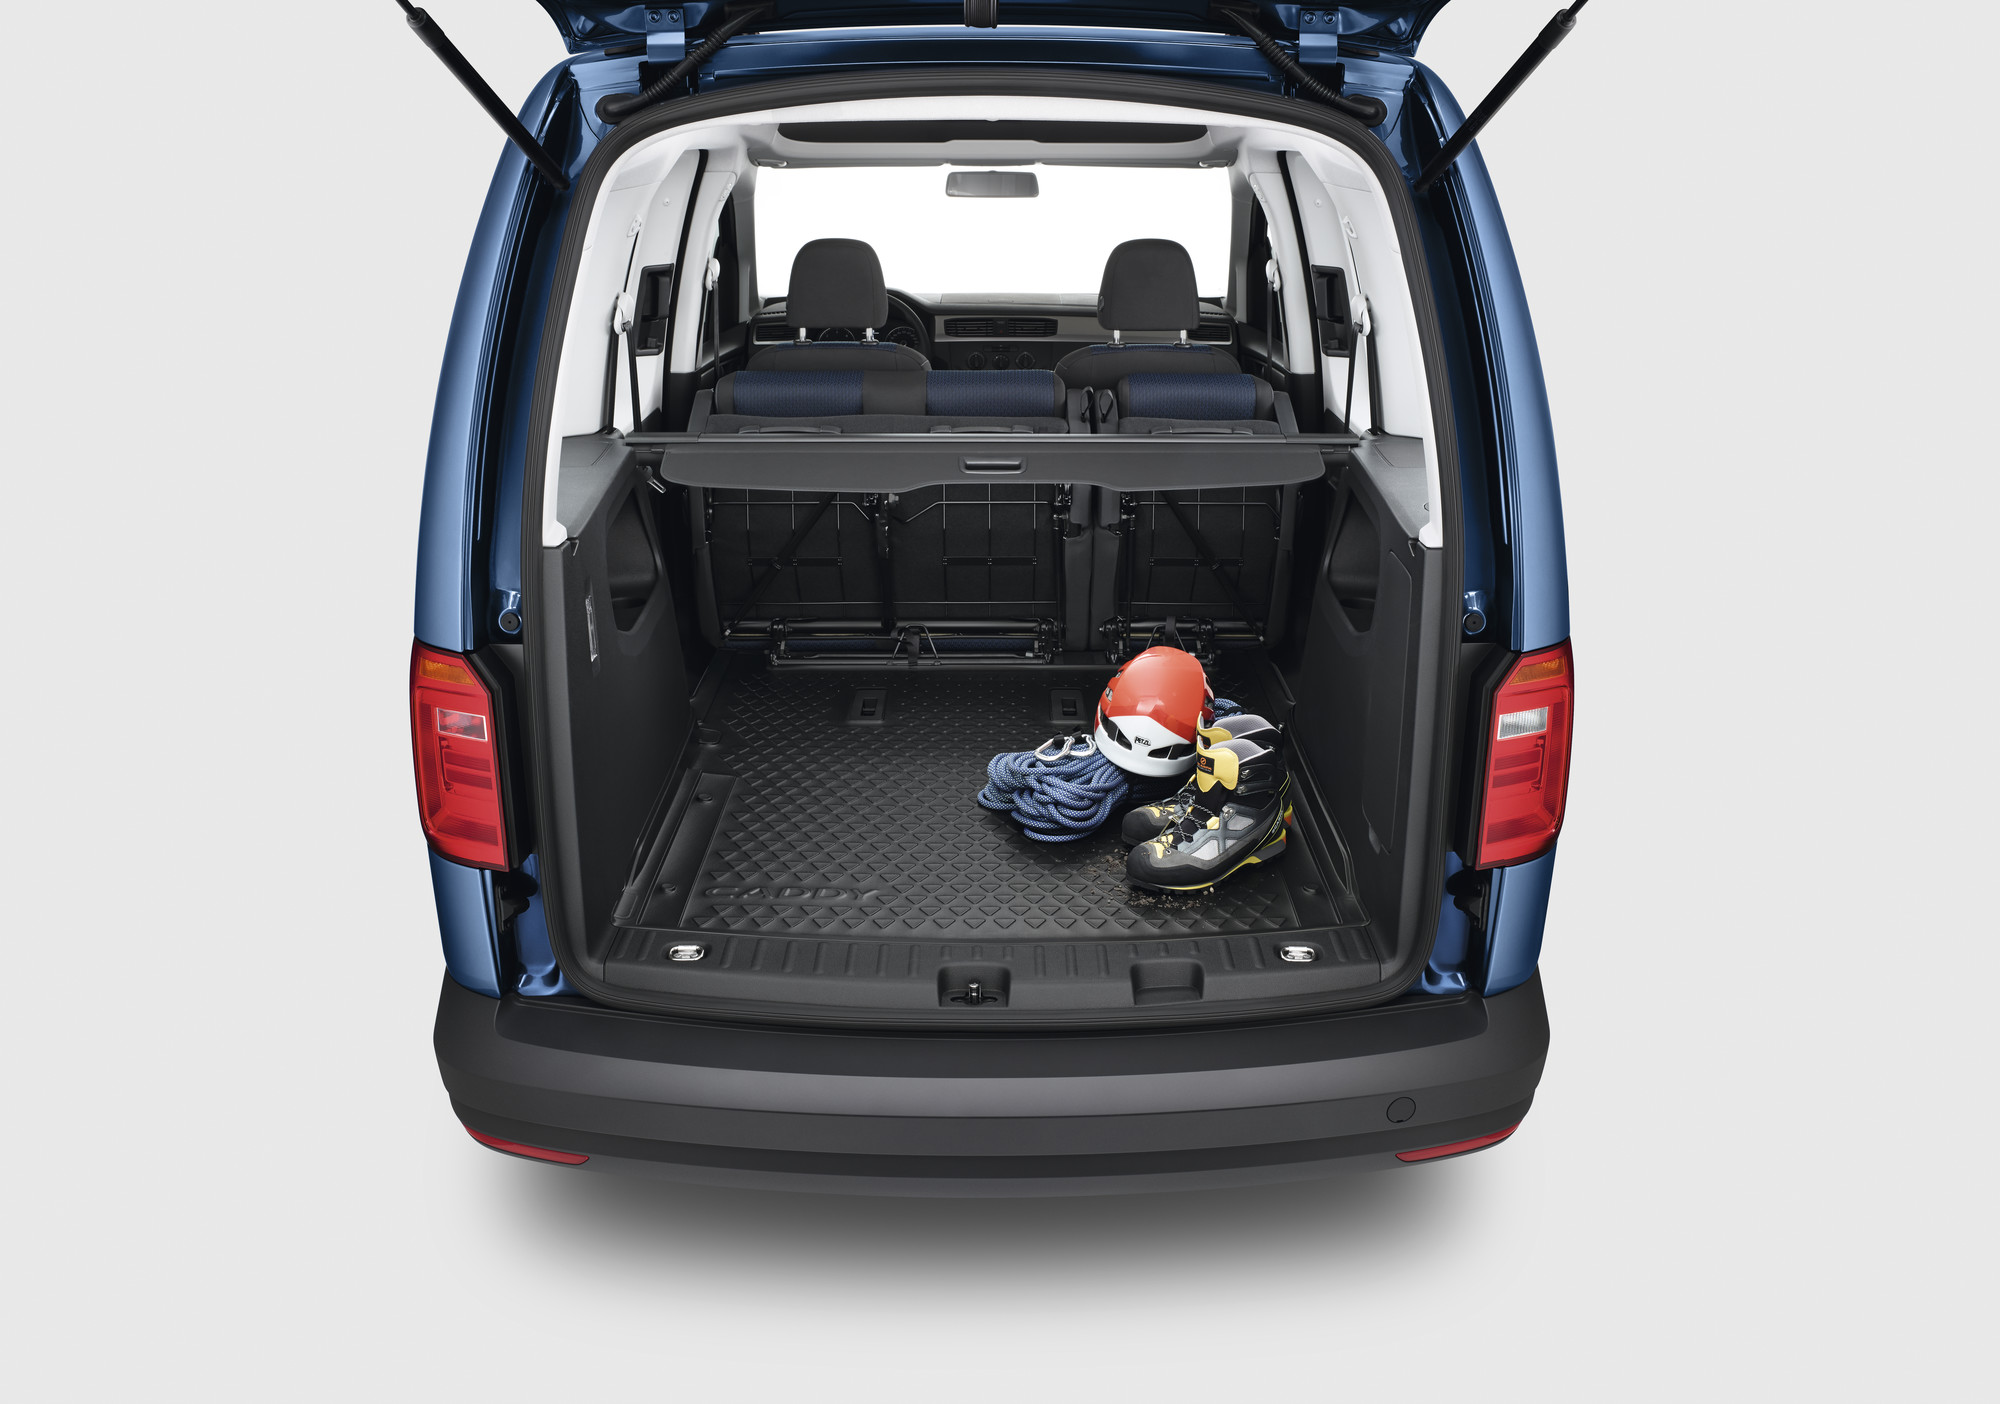 gep ckraumschale original vw caddy 5 7 sitzer kofferraum. Black Bedroom Furniture Sets. Home Design Ideas